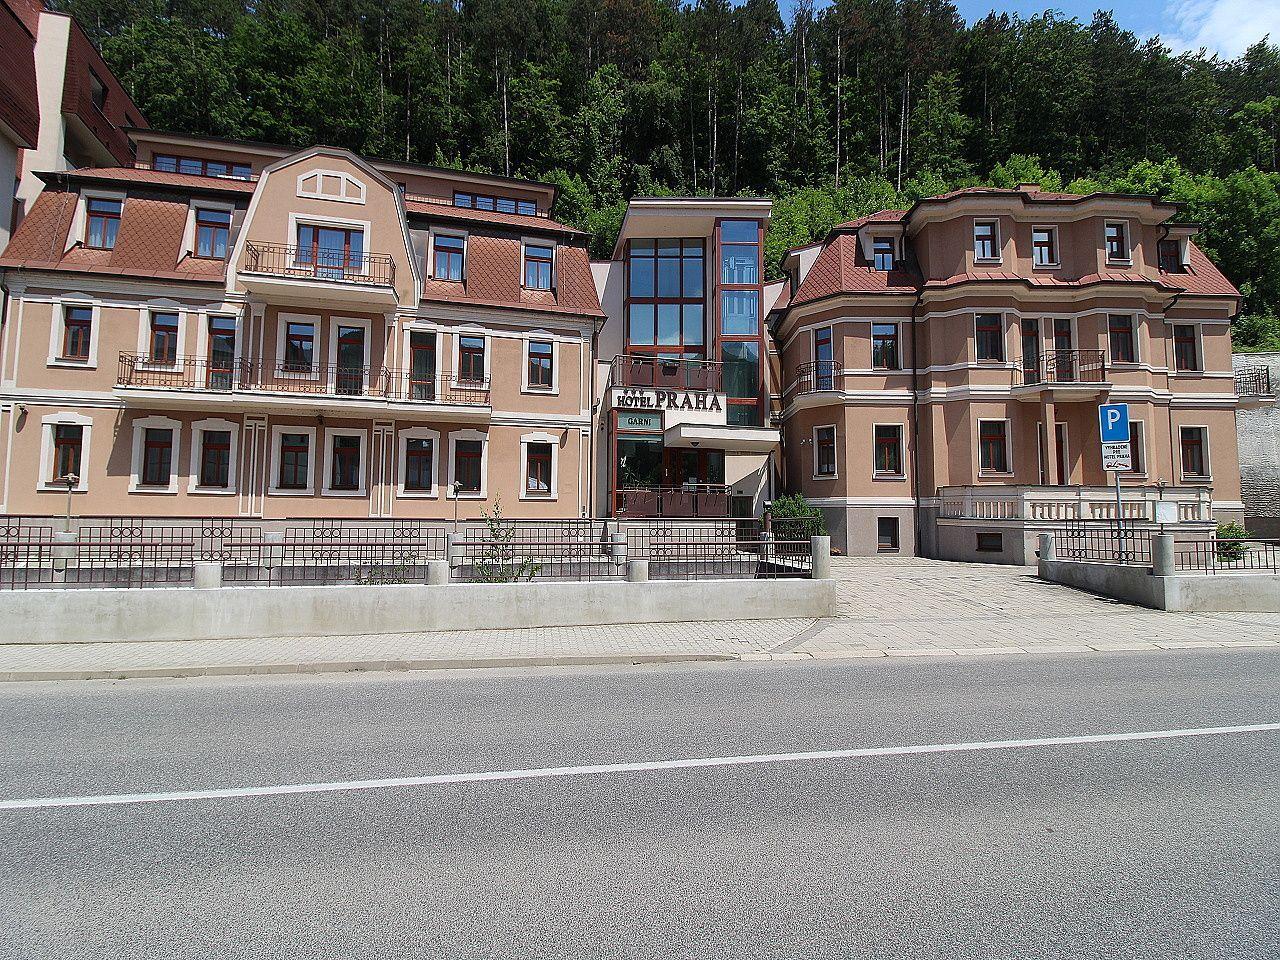 Hotel-Predaj-Trenčianske Teplice-0.00 €